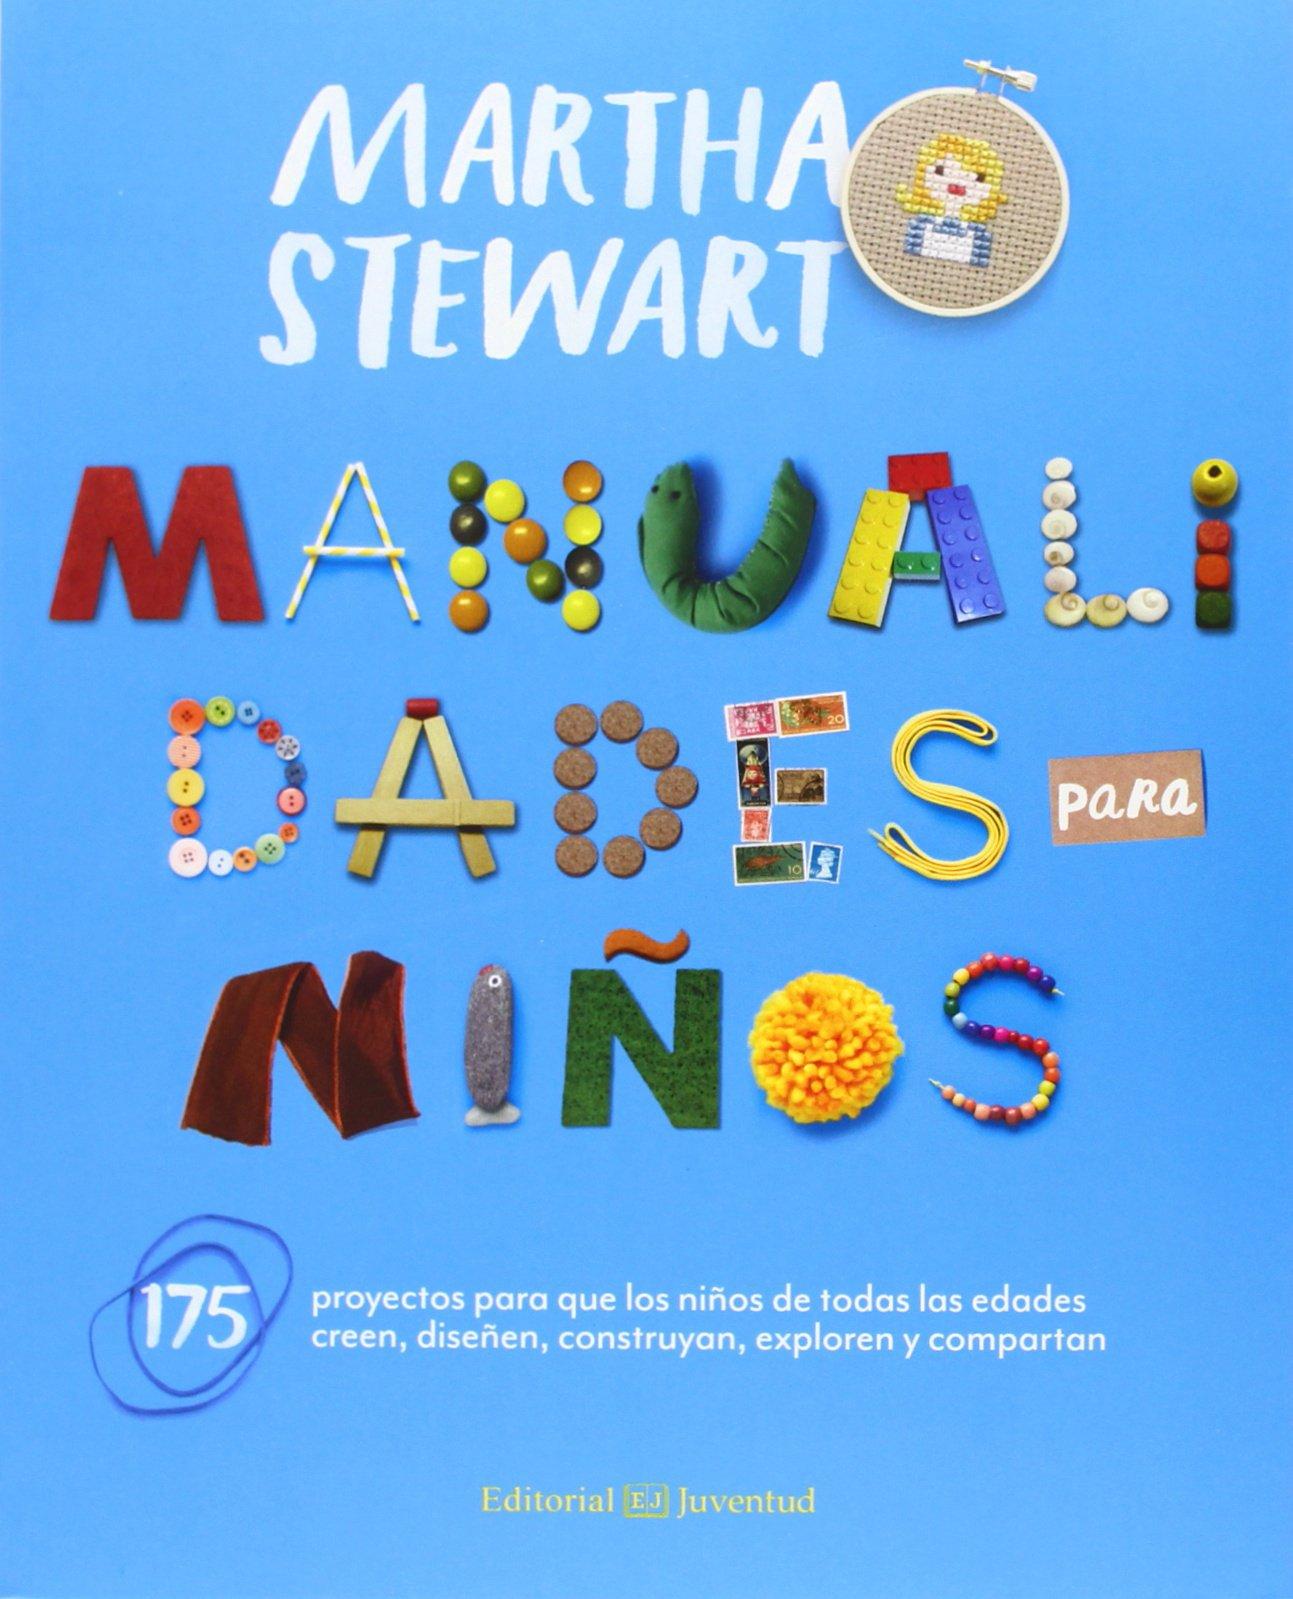 Manualidades para niños de Martha Stewart